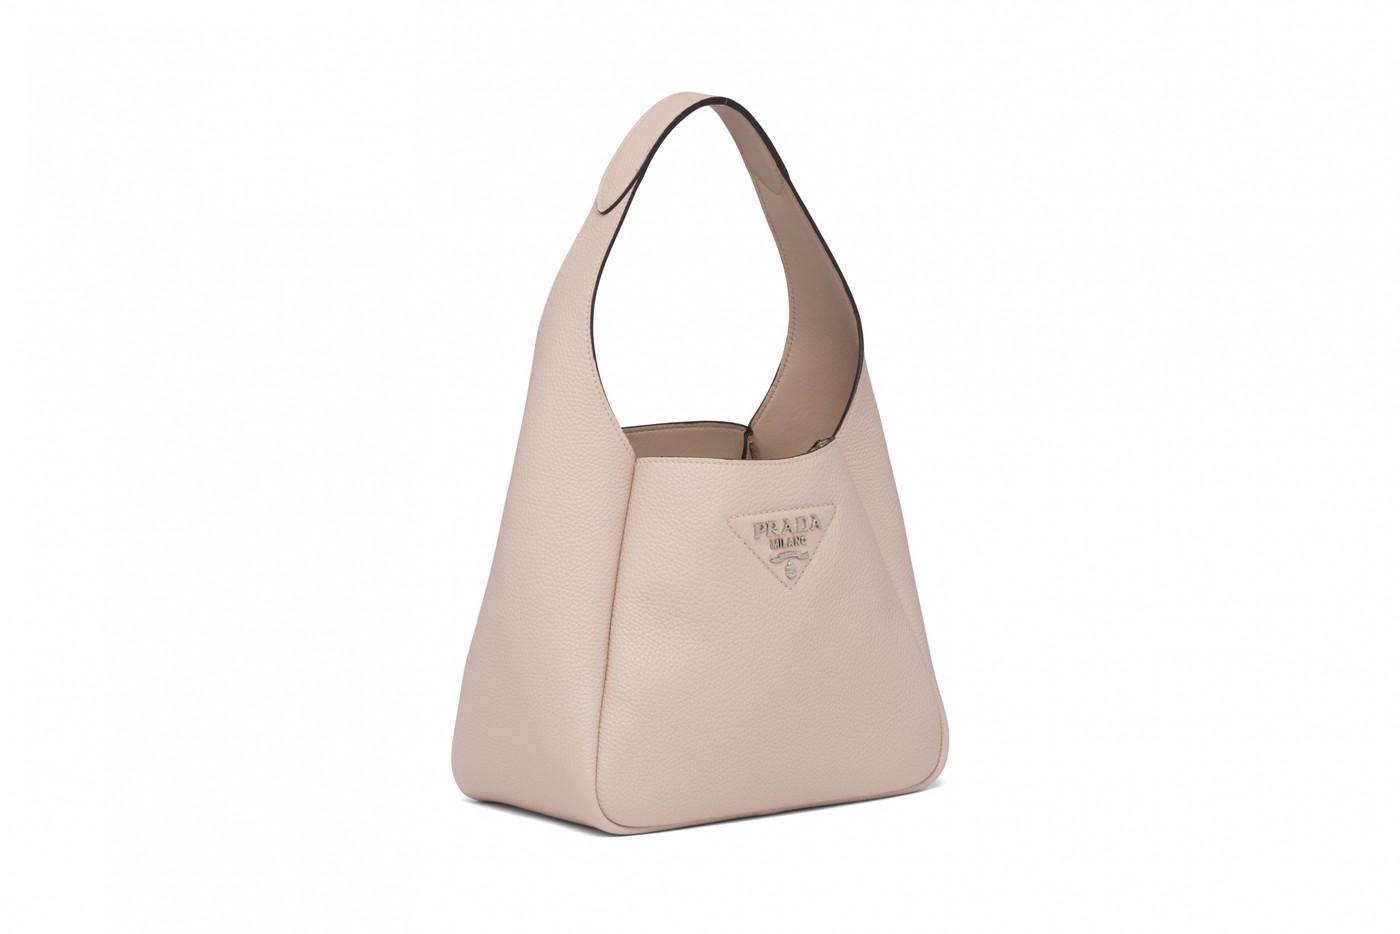 prada spring summer 2021 accessories collection cleo re edition nylon bag handbags